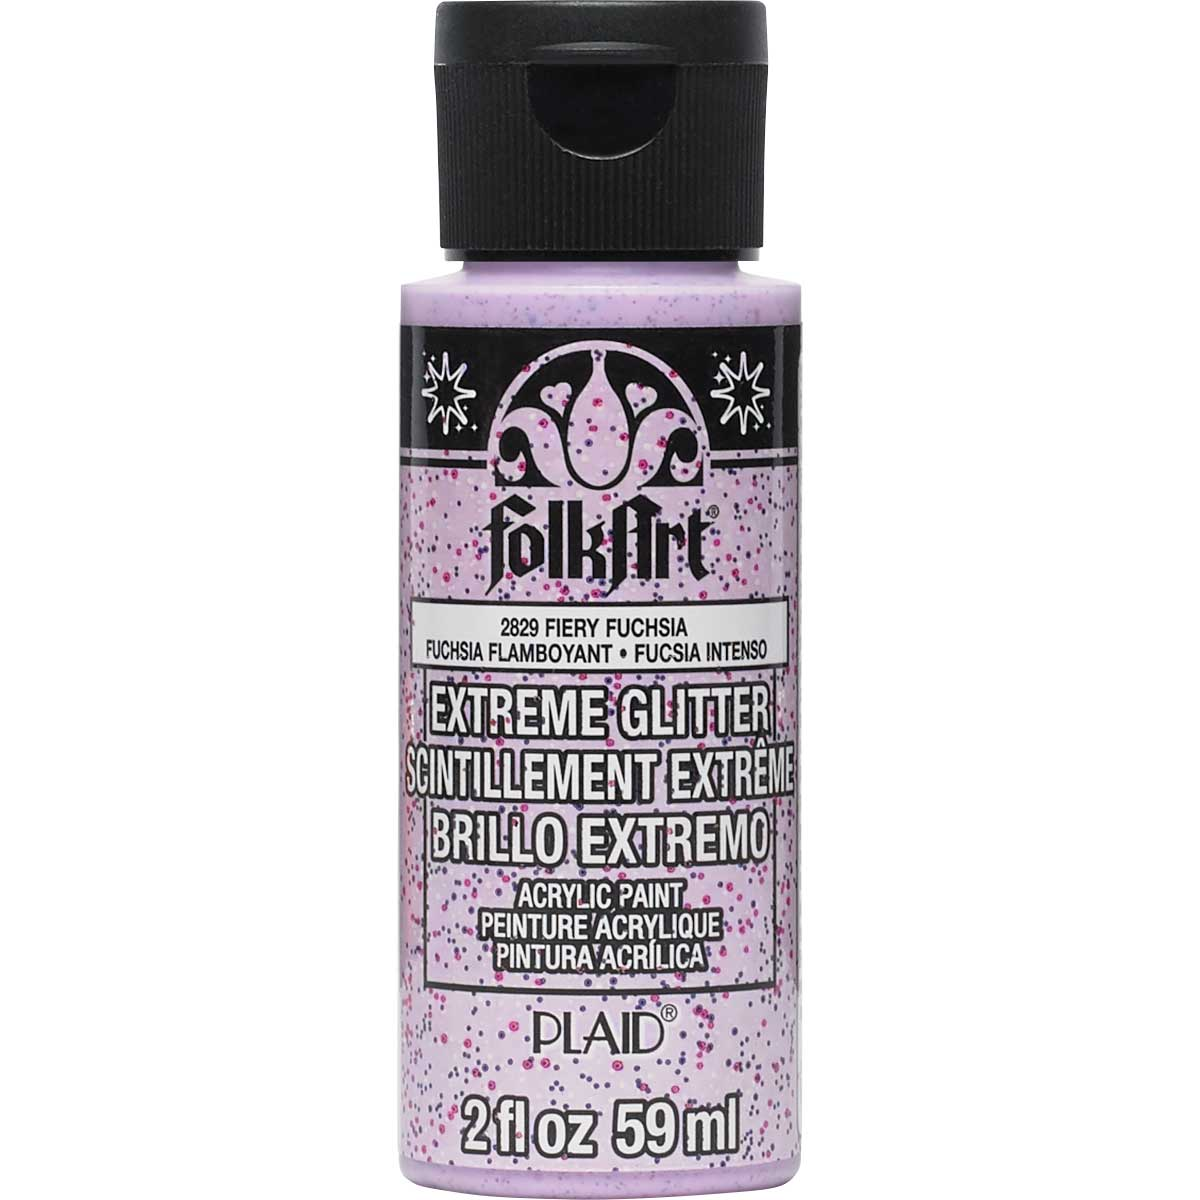 FolkArt ® Extreme Glitter™ - Fiery Fuchsia, 2 oz.